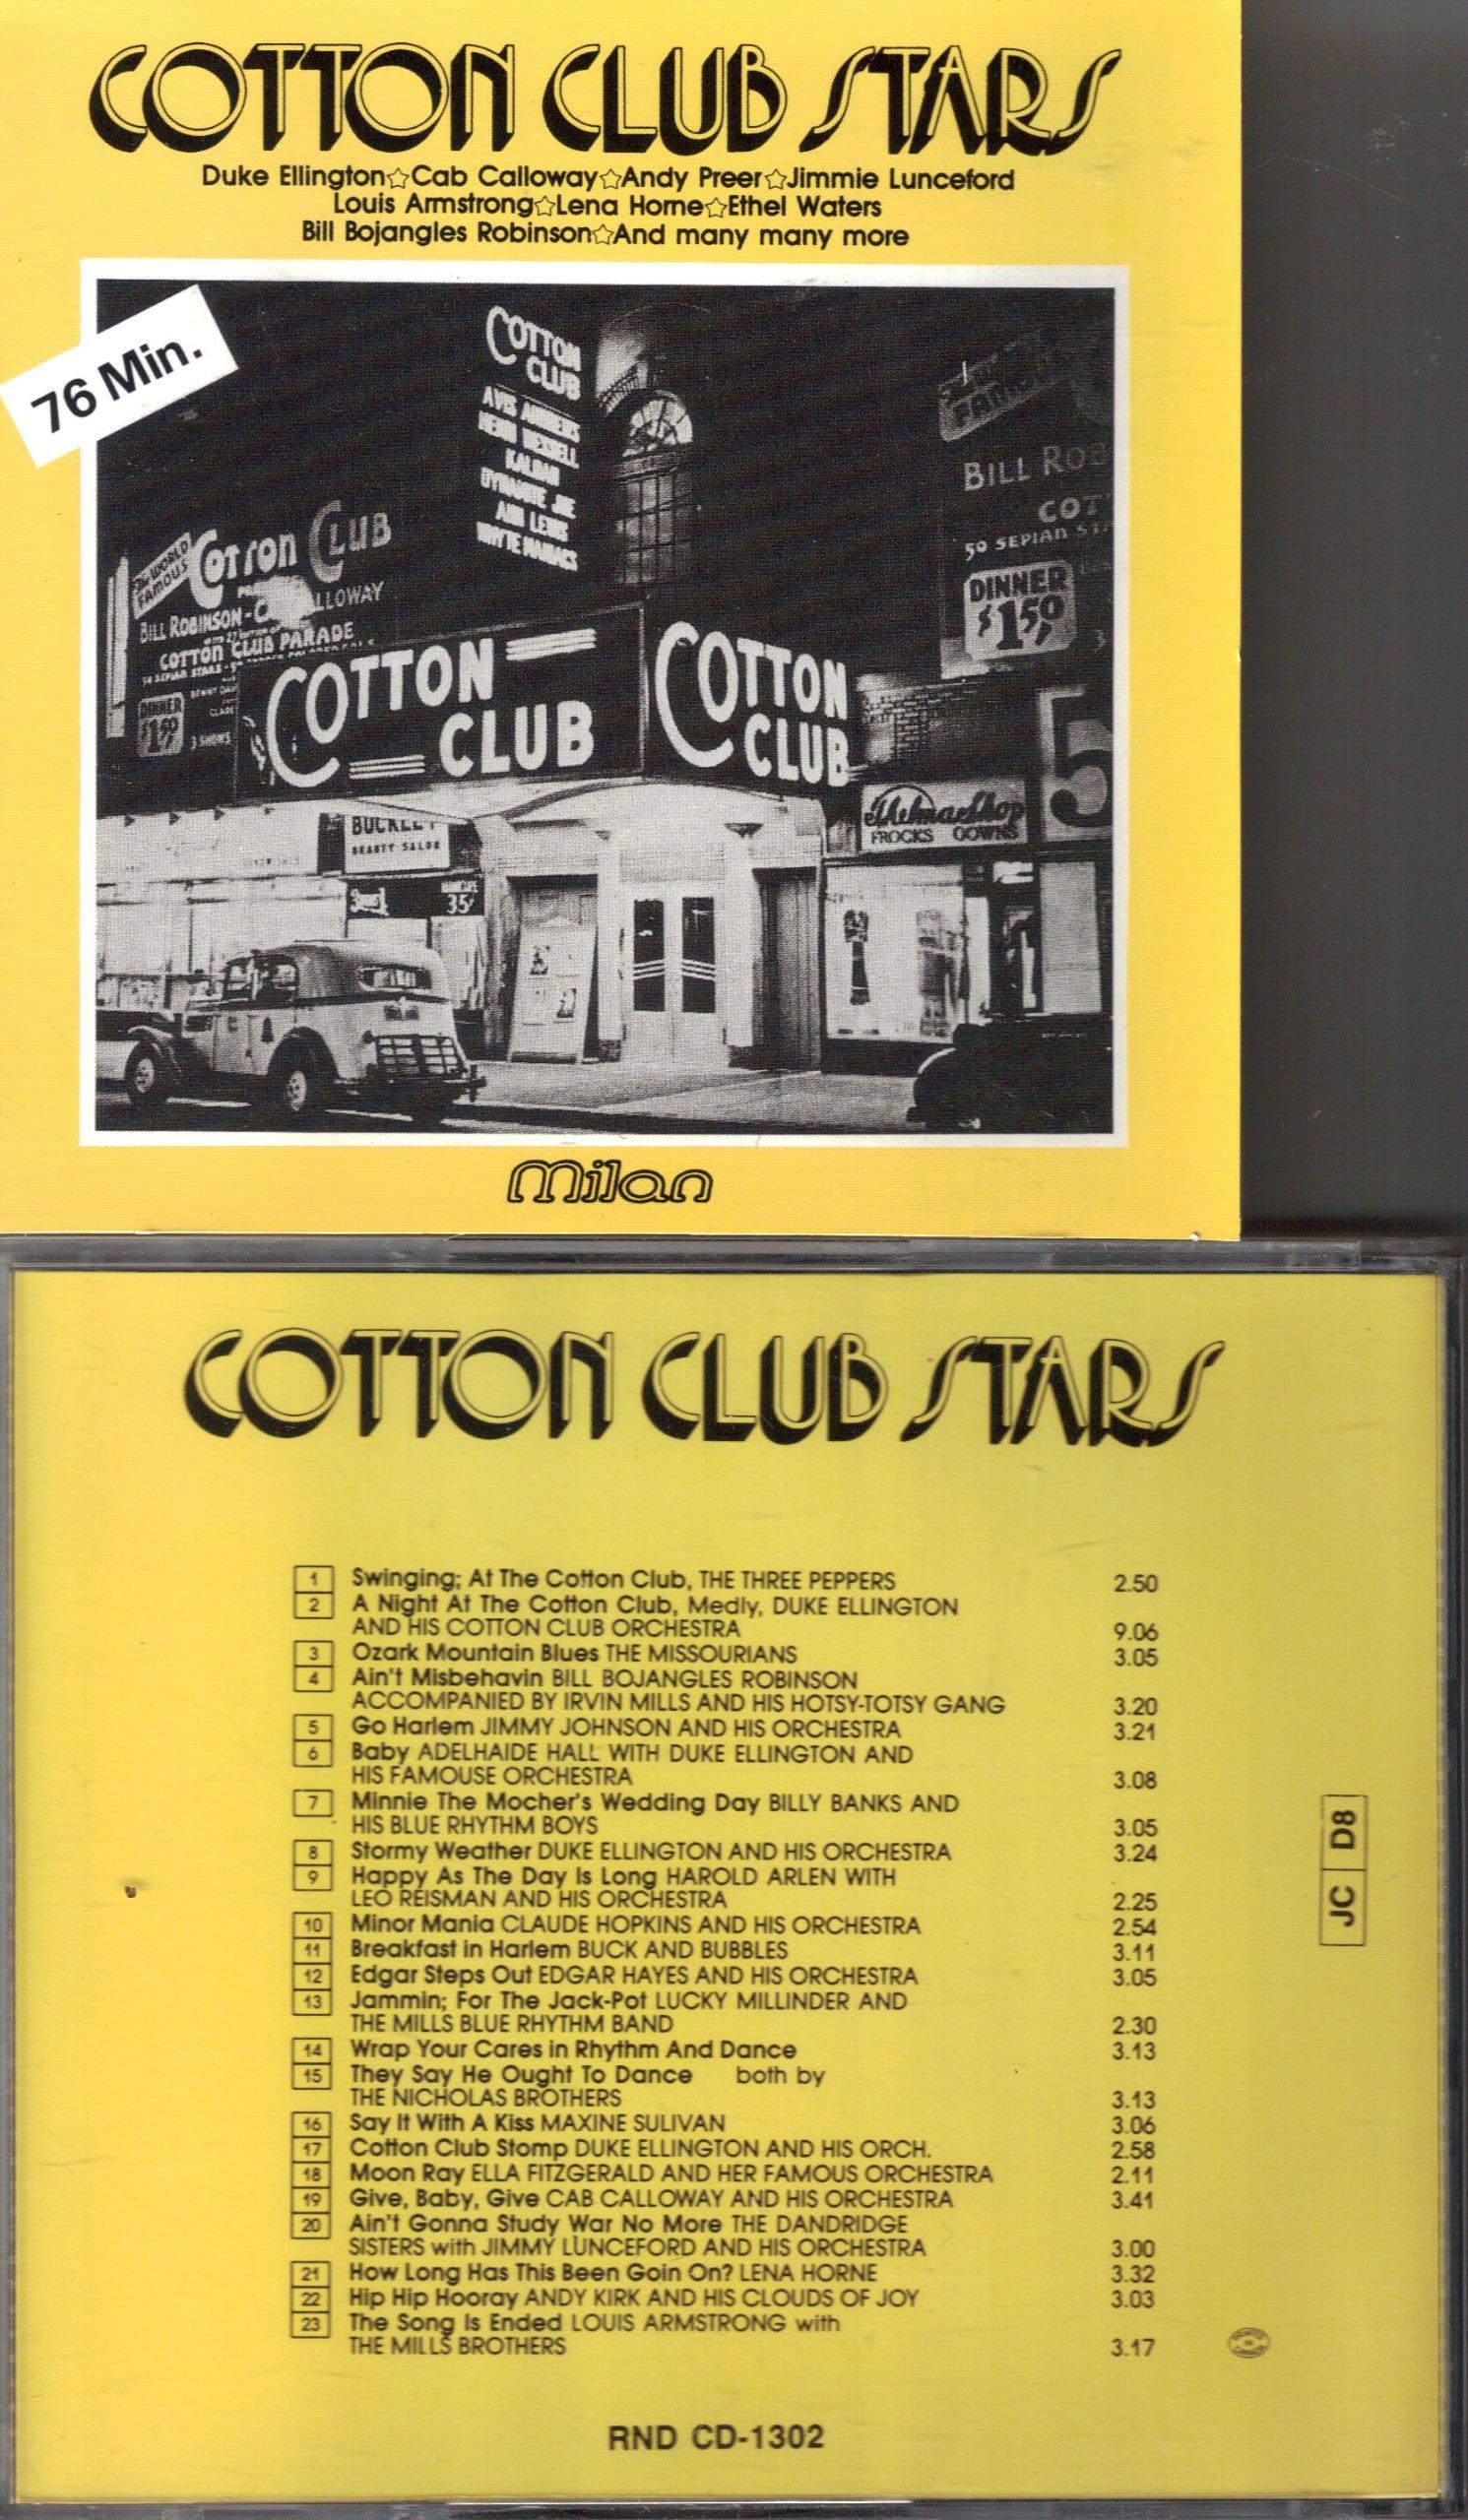 Cotton Club Stars